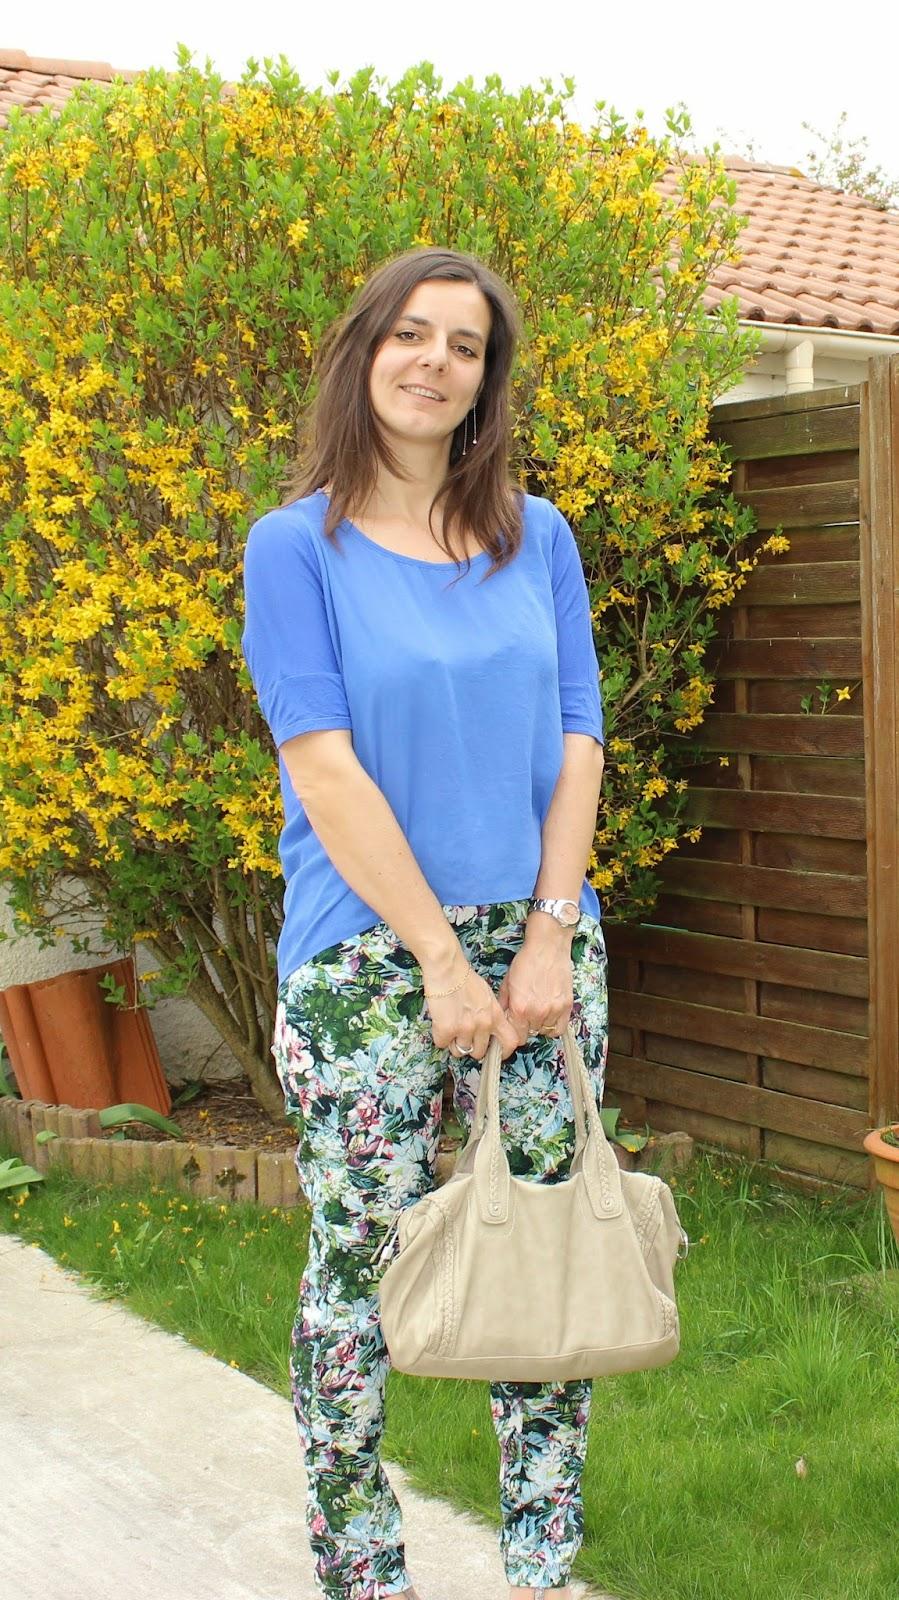 Top mango bleu, pantalon tropical Vero Moda, Chaussures bleues Kookai